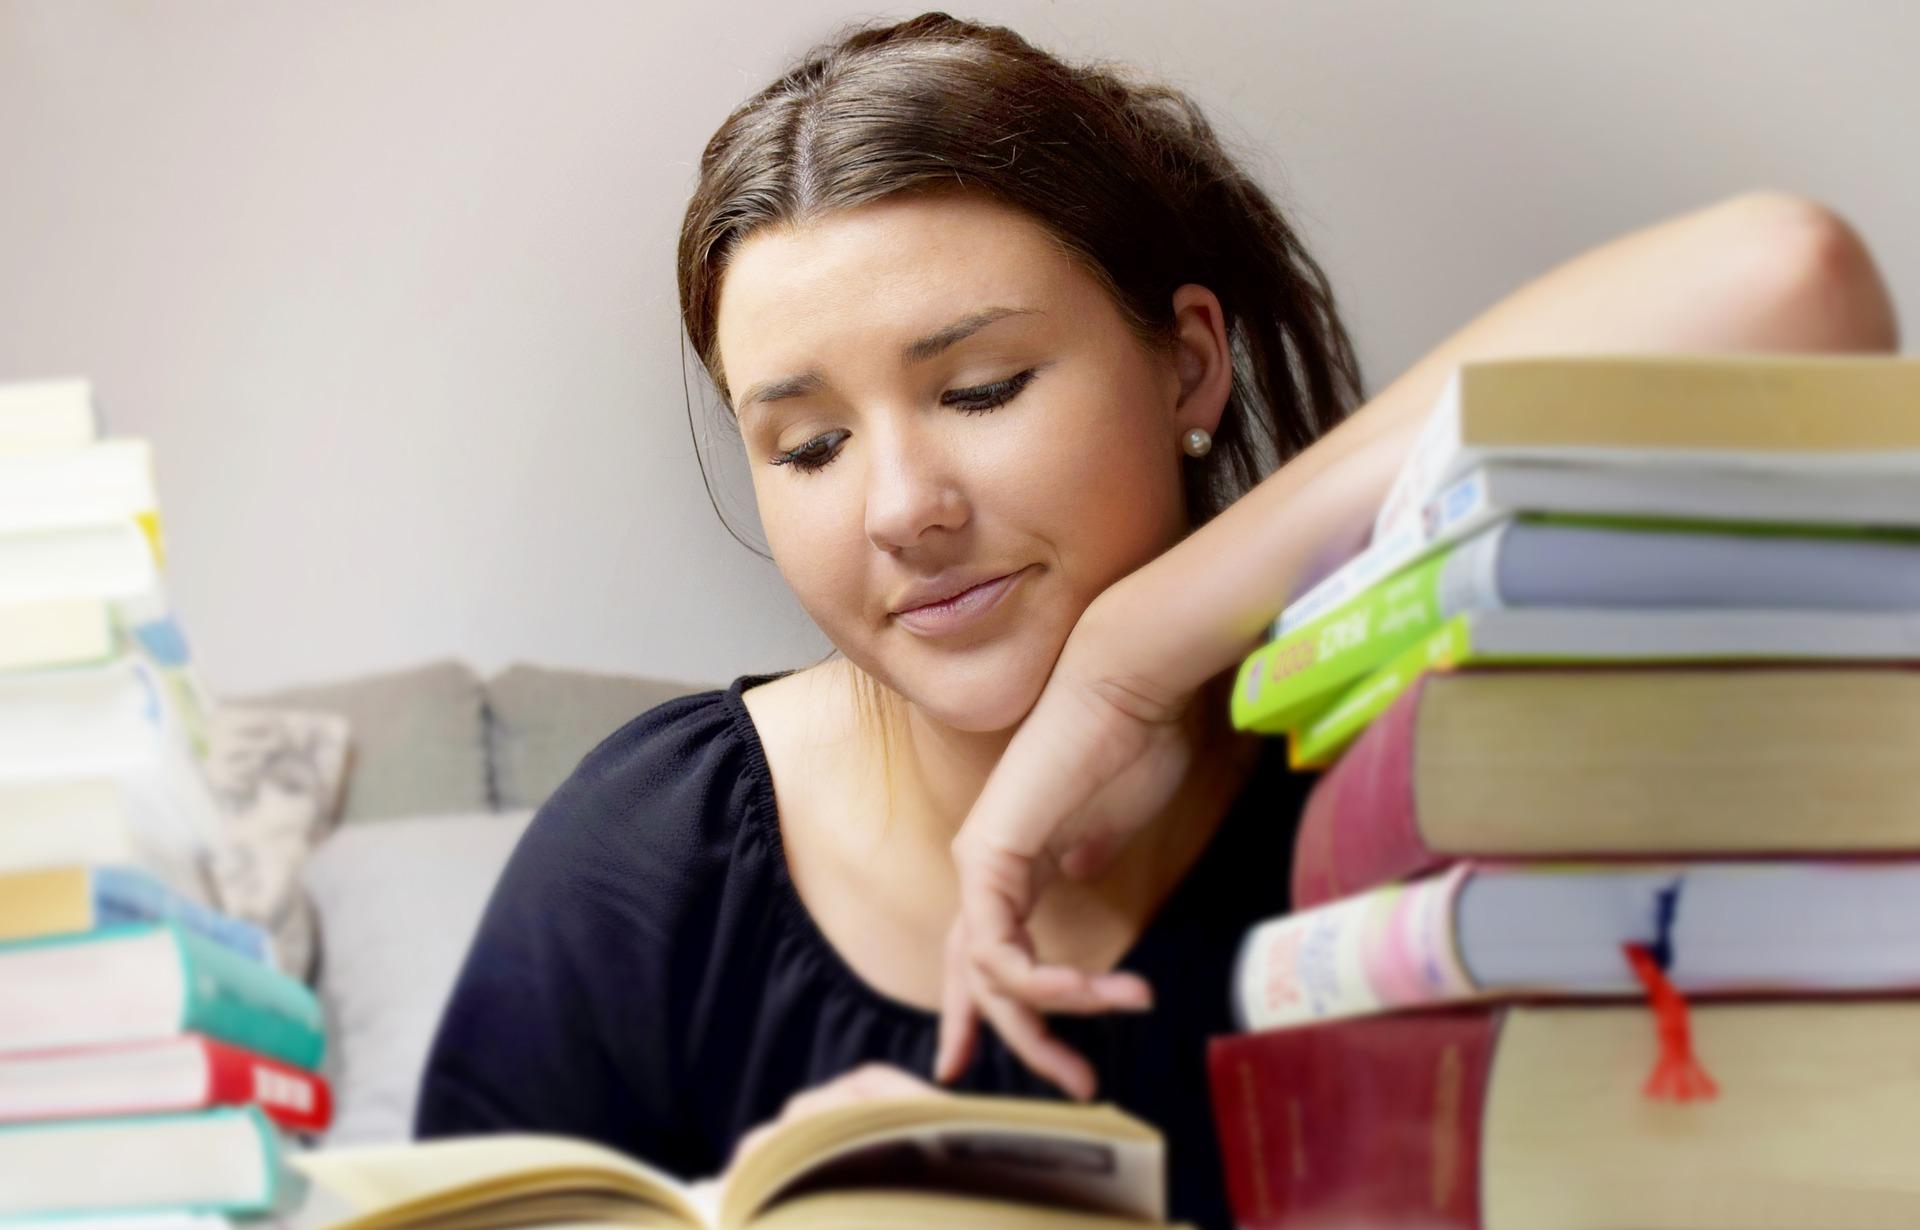 Projeto oferece bolsas de estudo para alunos de baixa renda